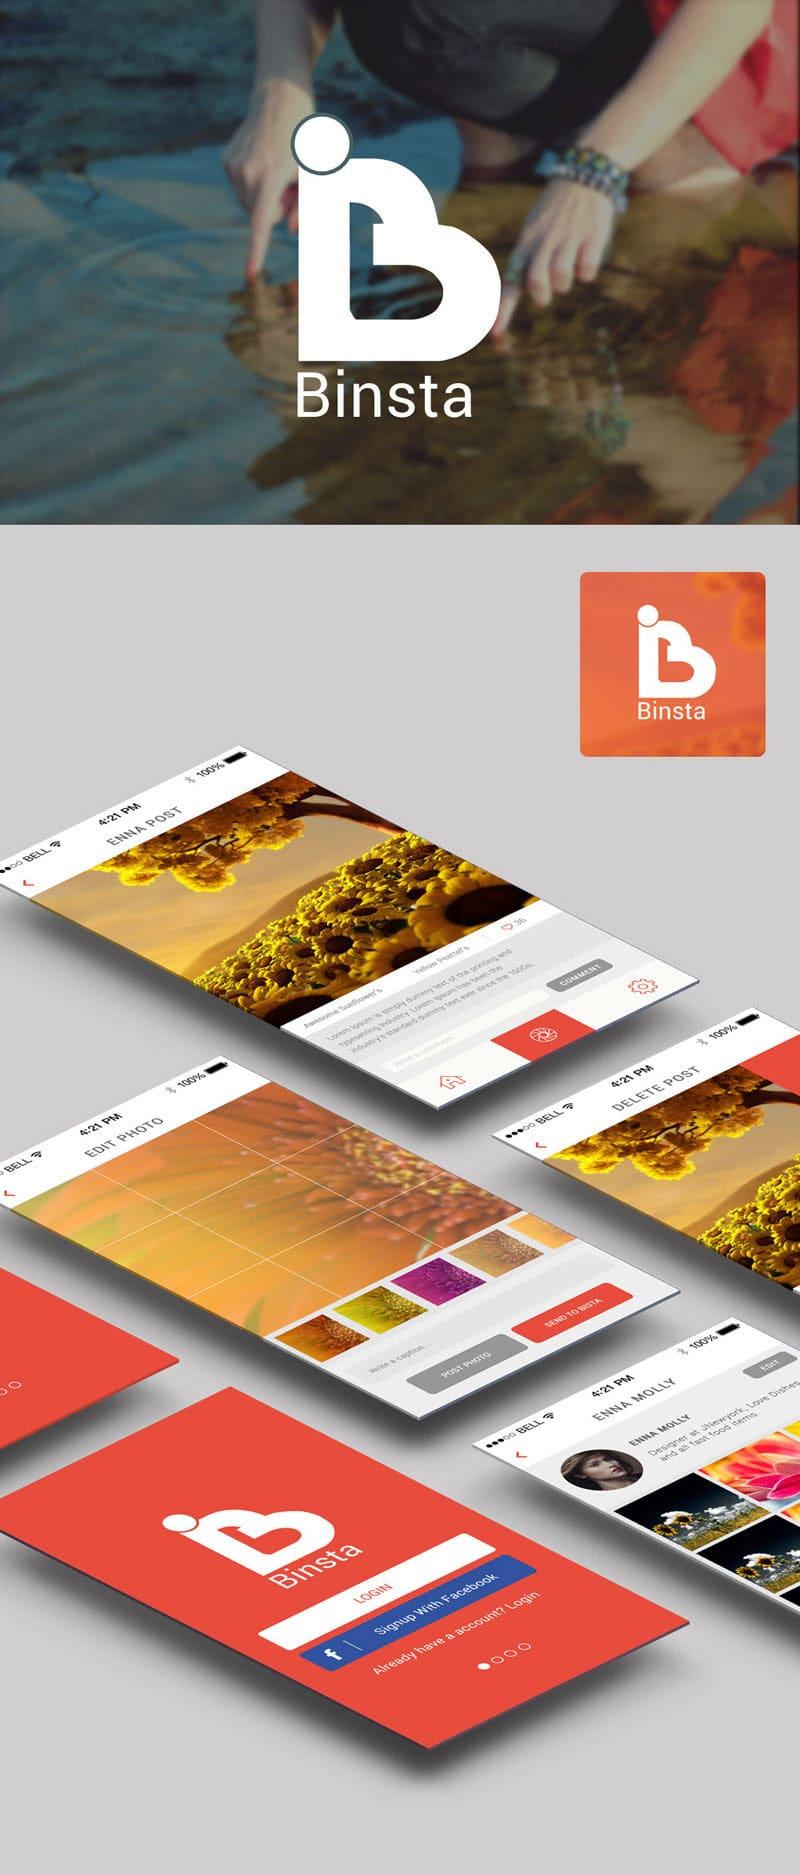 Free Binsta App UI PSD